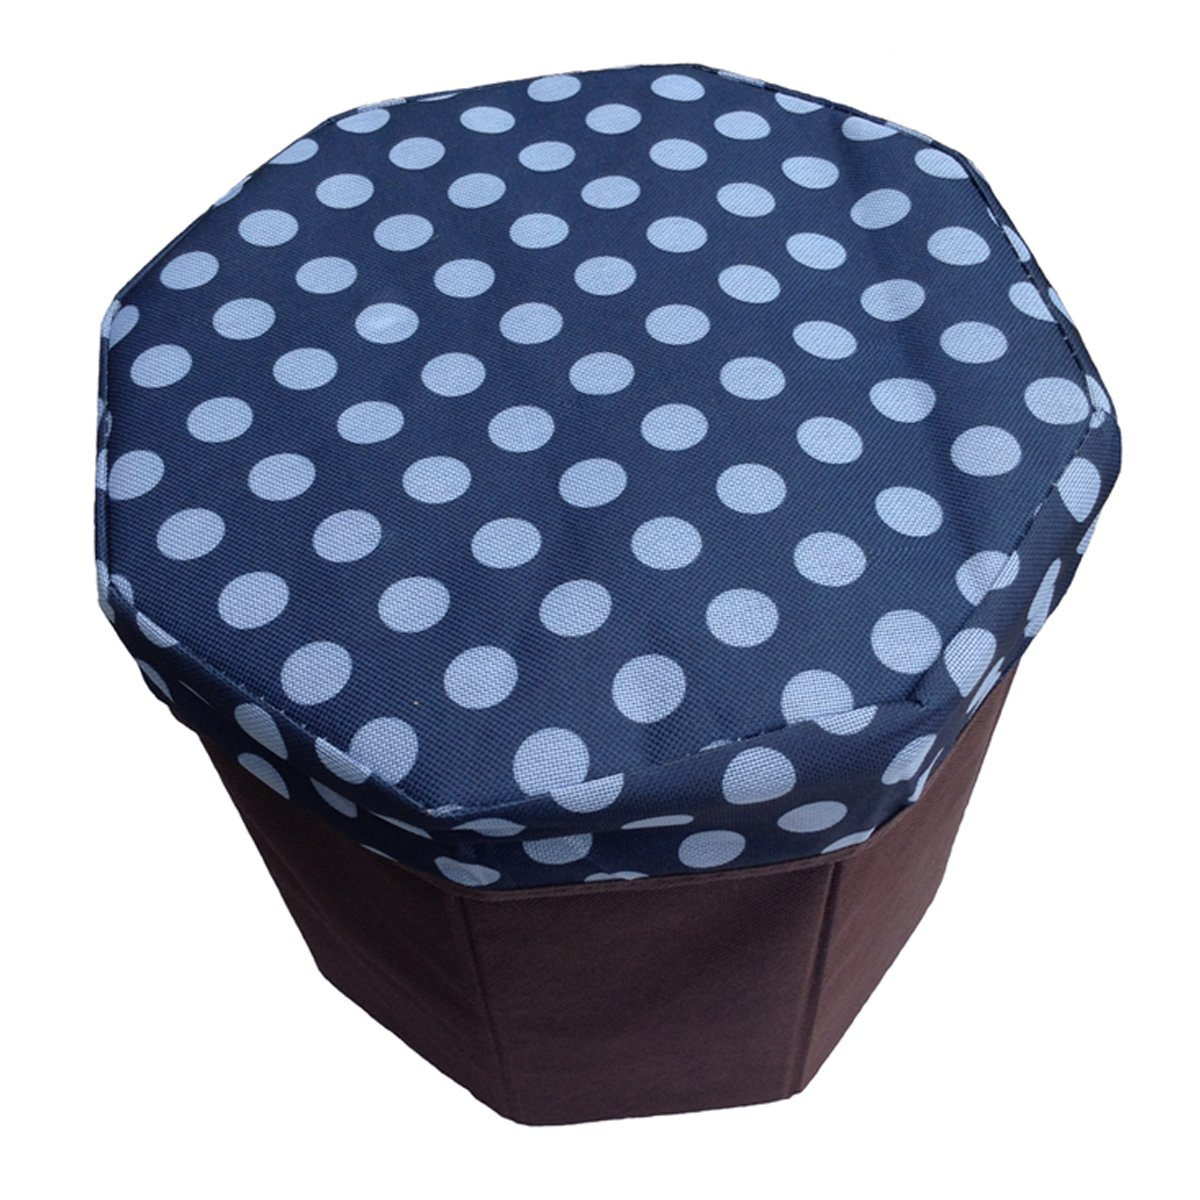 Daidu Non-Woven Fabric Foldable Storage Organizer Bin Box Ottoman Stool 9.8 x 9.8 x 9.8 inches for Student Kid Pupil Bedroom Dorm Desk,Blue